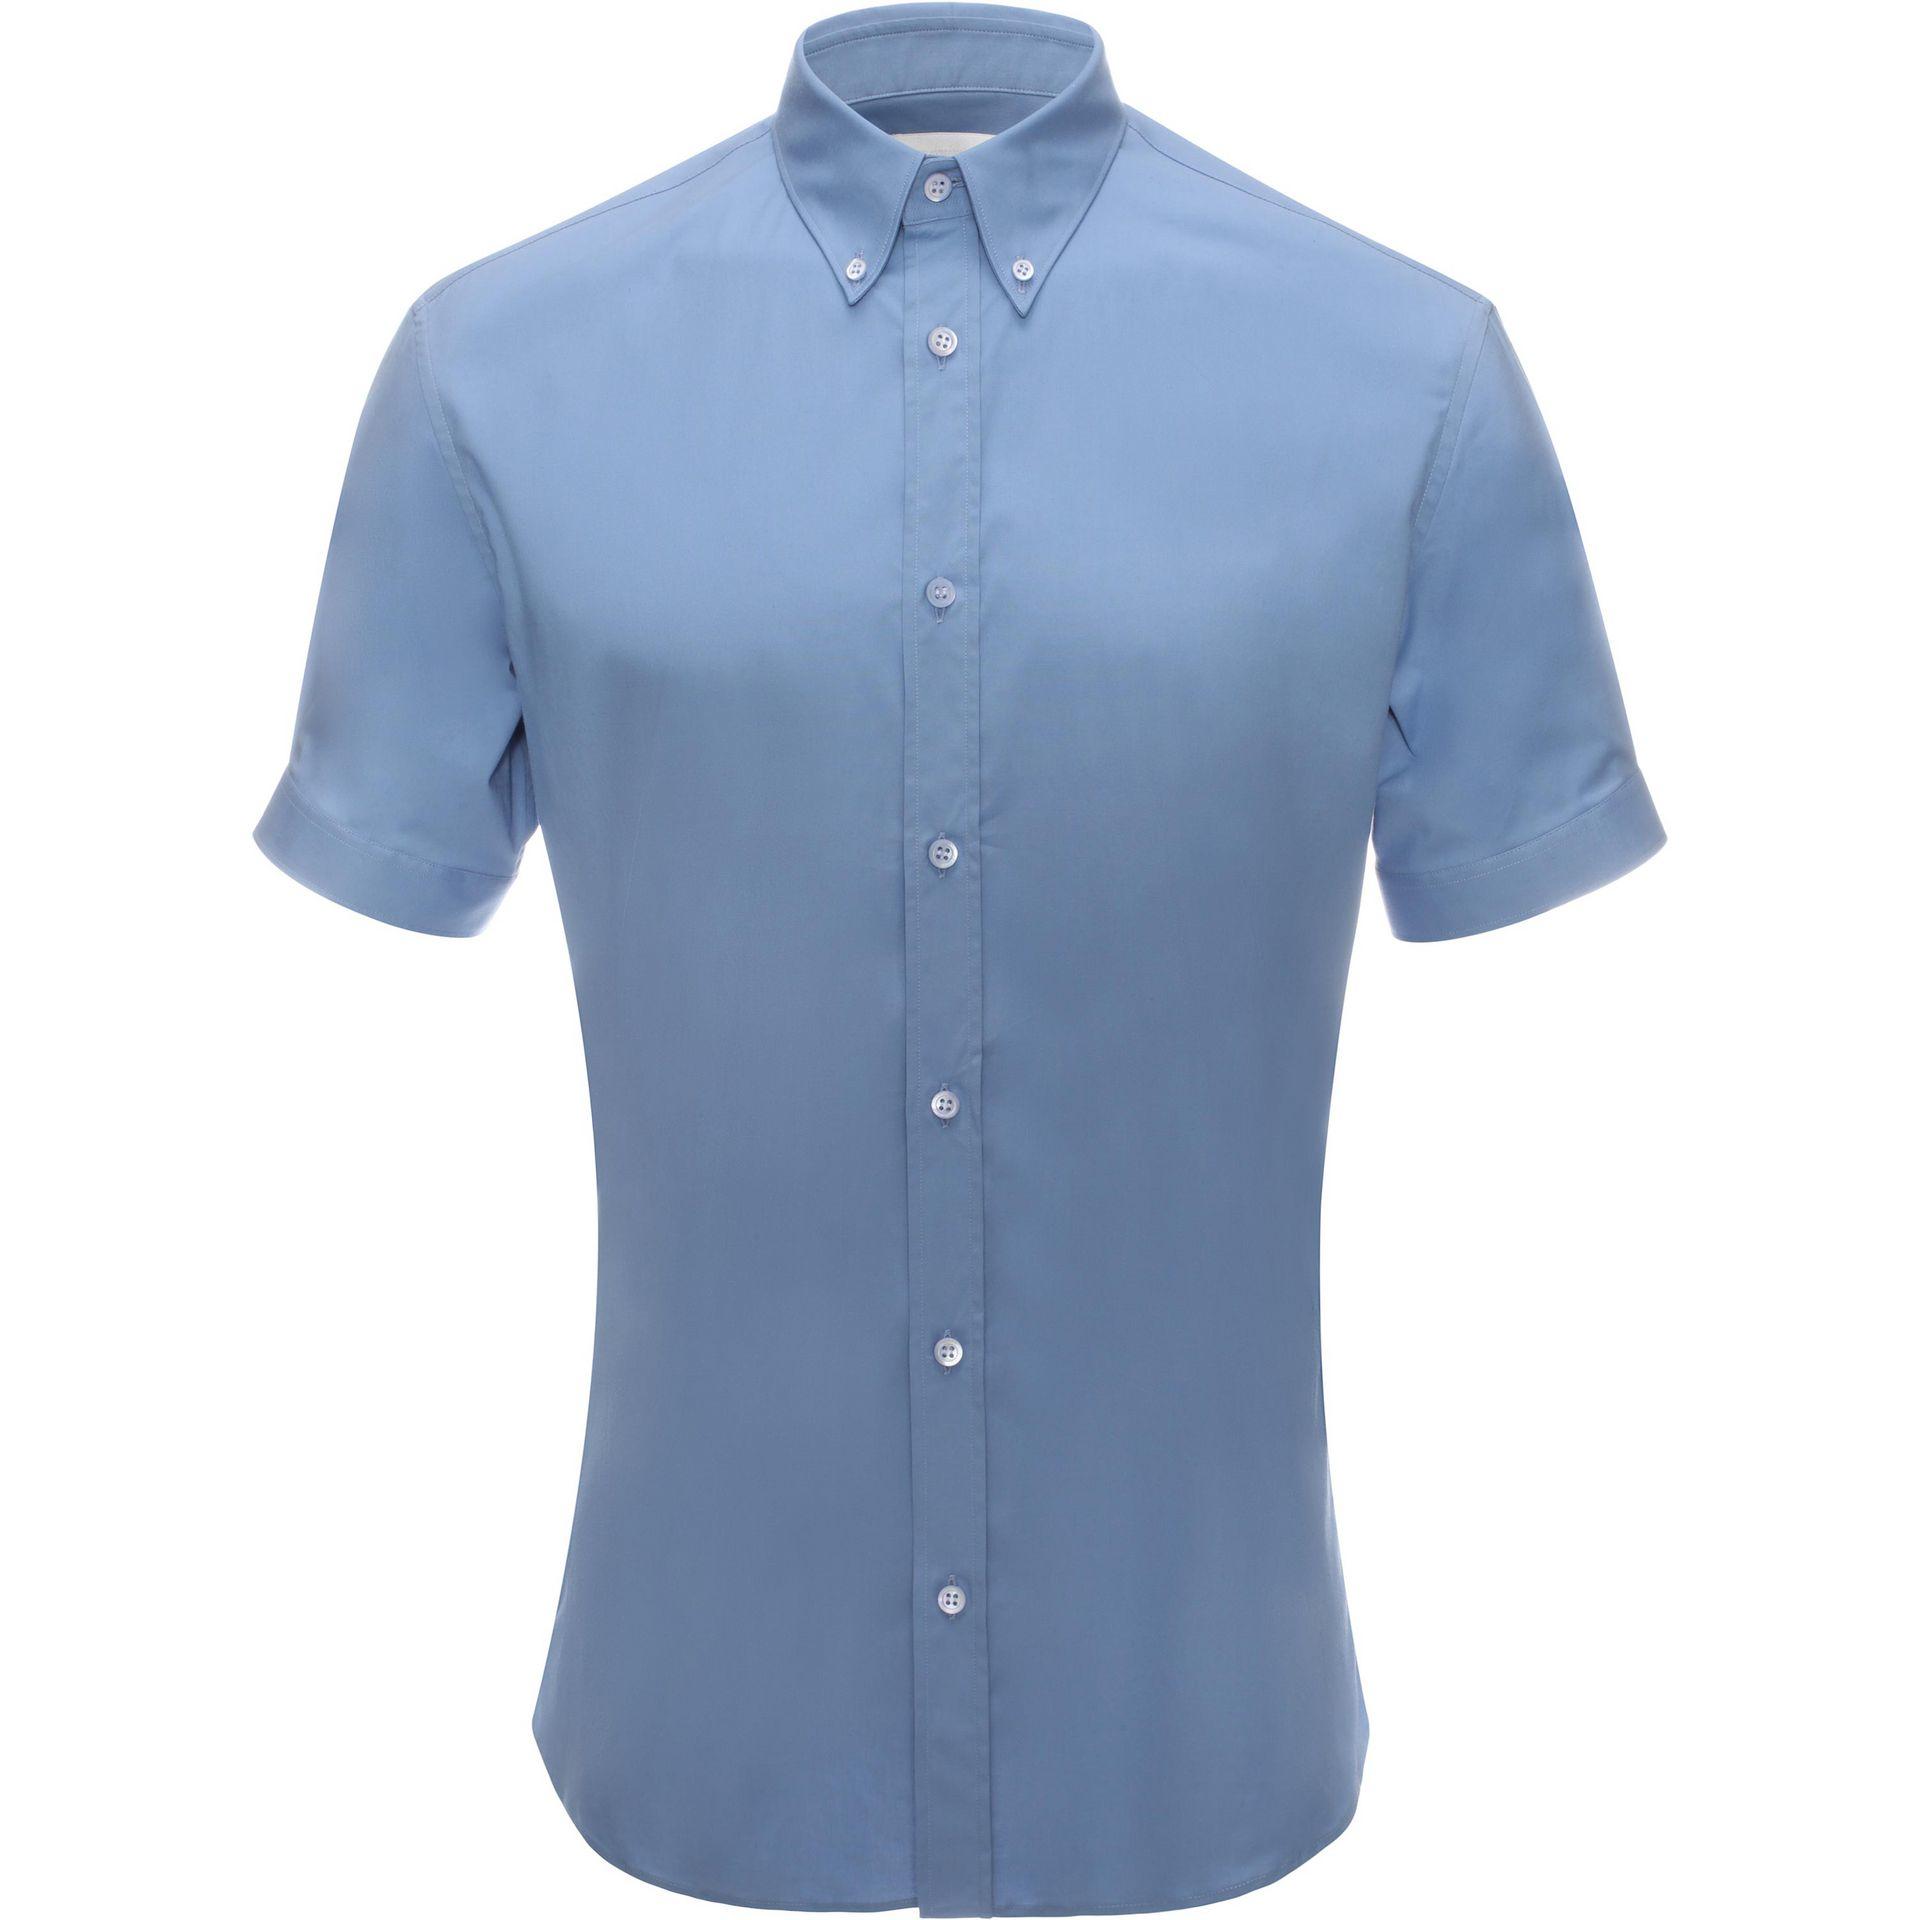 Alexander Mcqueen Cotton Wide Cuff Short Sleeve Shirt In